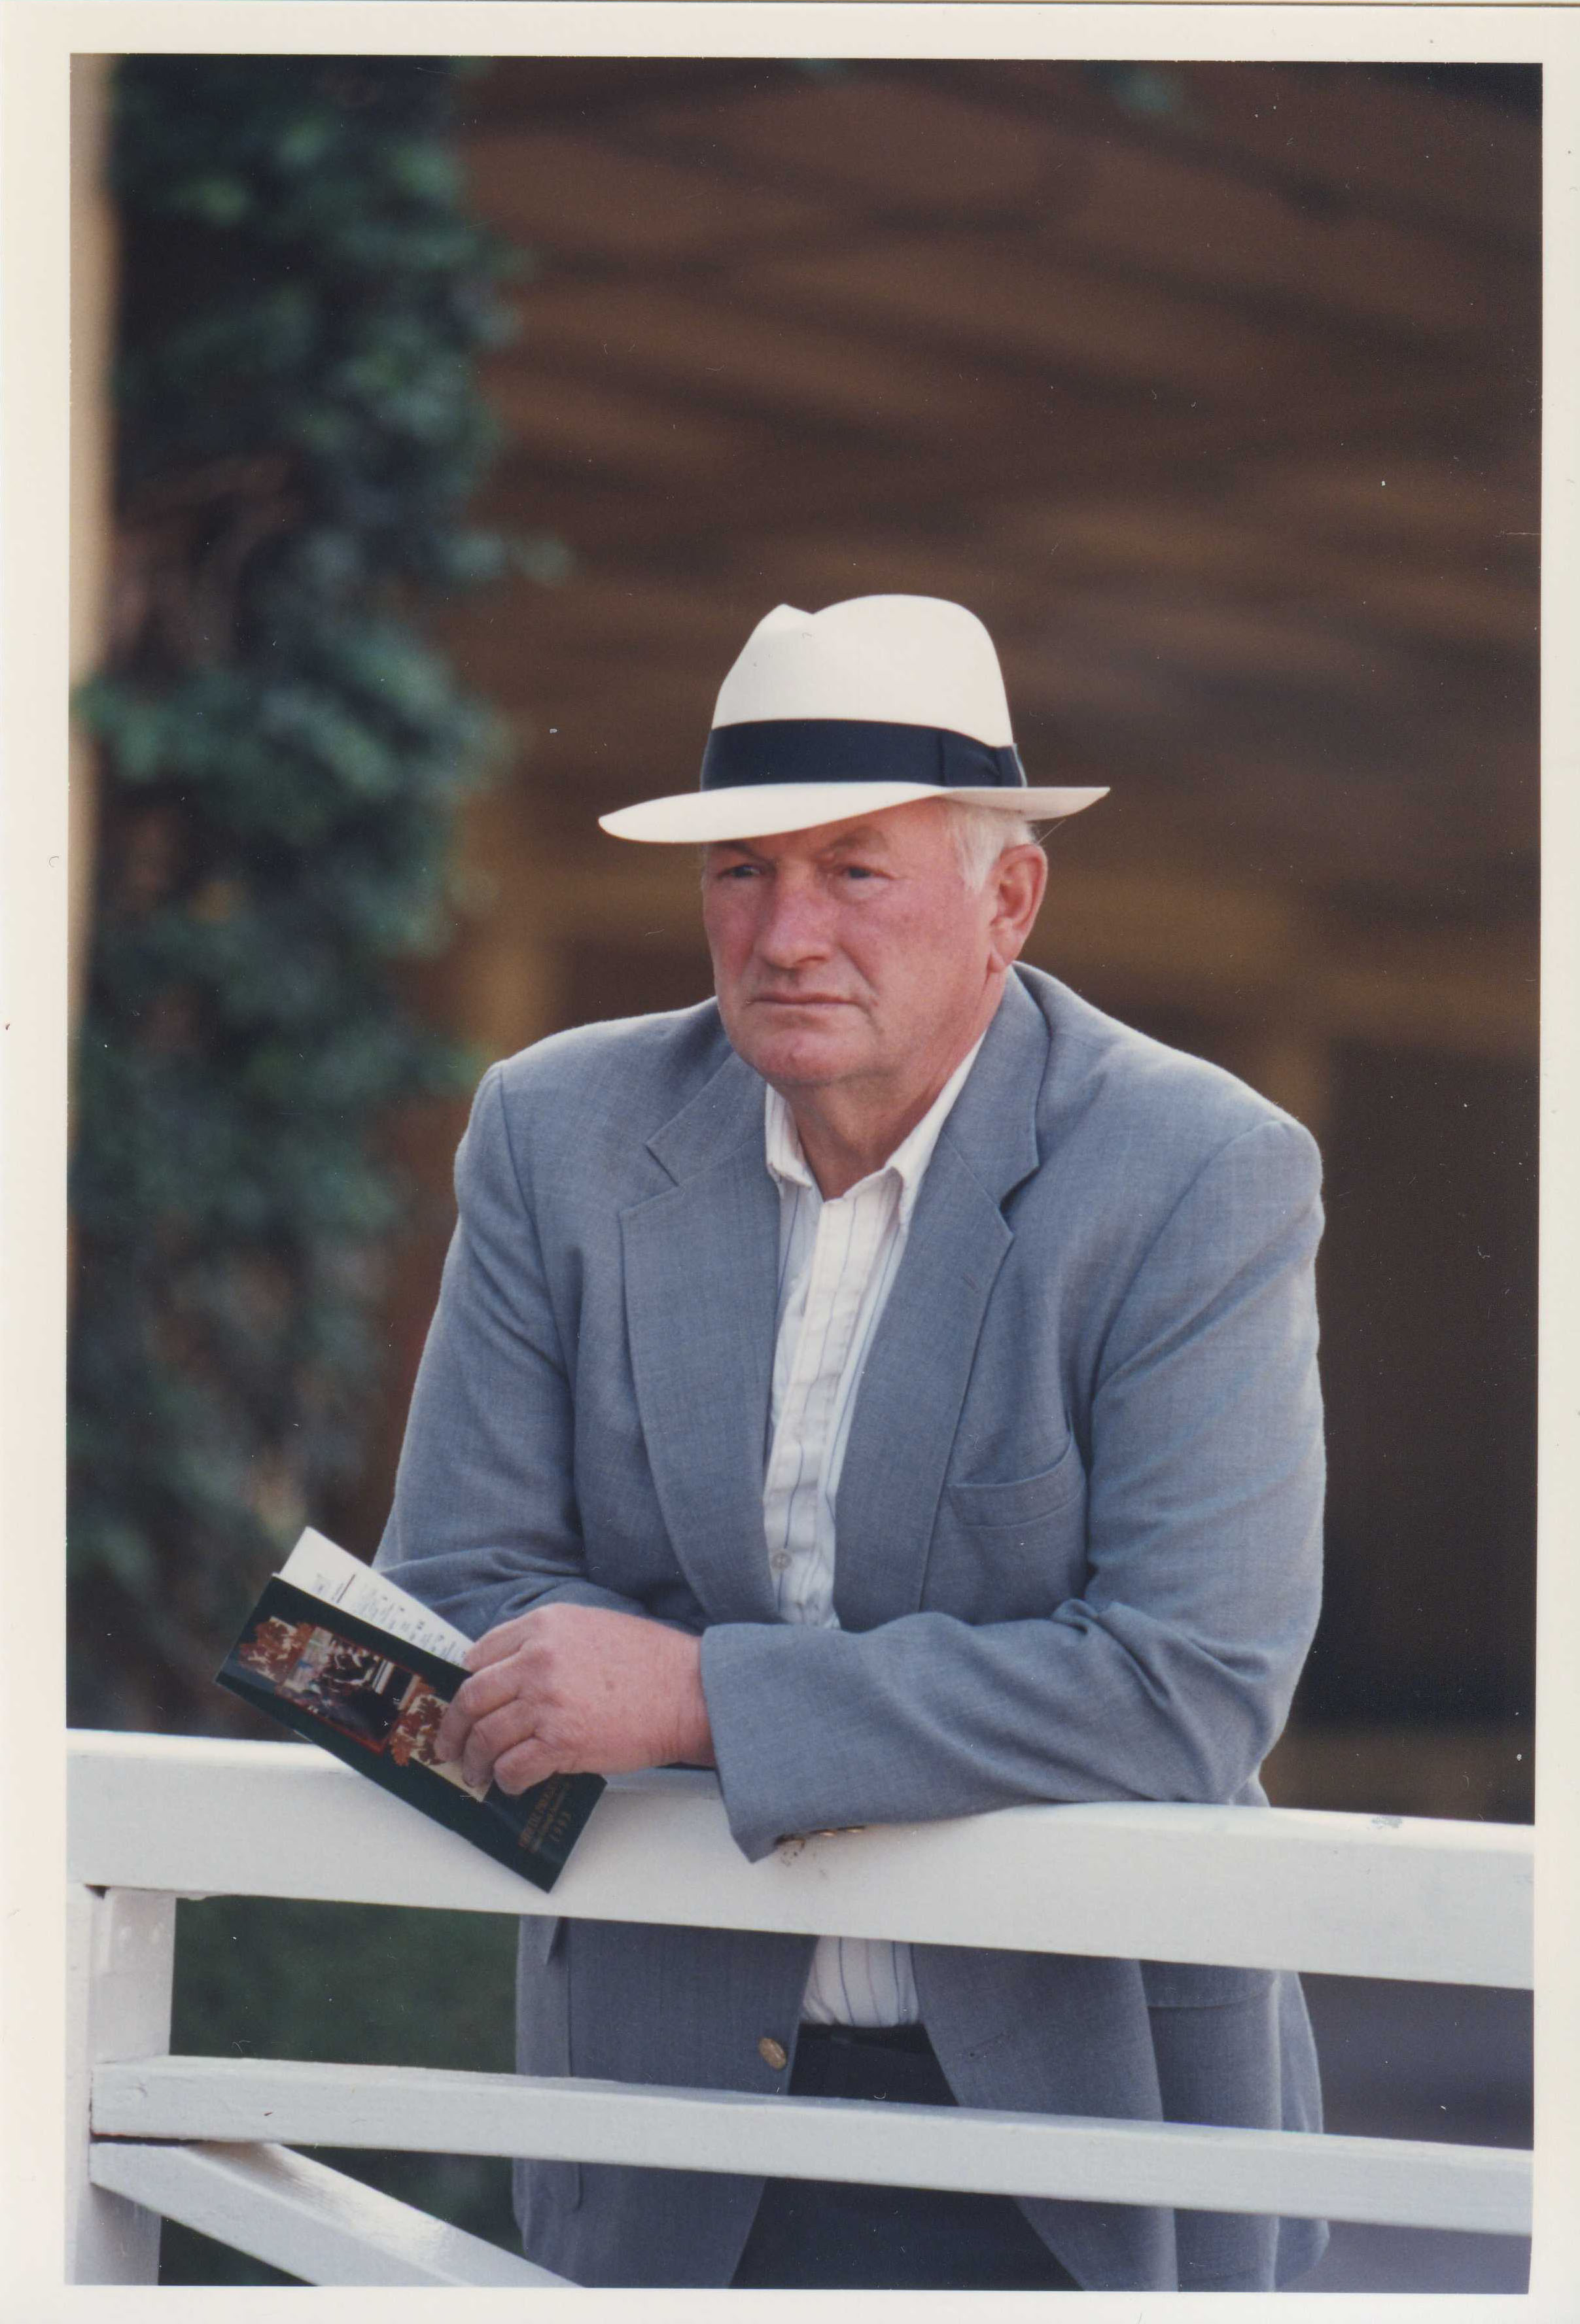 Allen Jerkens at Santa Anita Park, November 1993 (Barbara D. Livingston/Museum Collection)